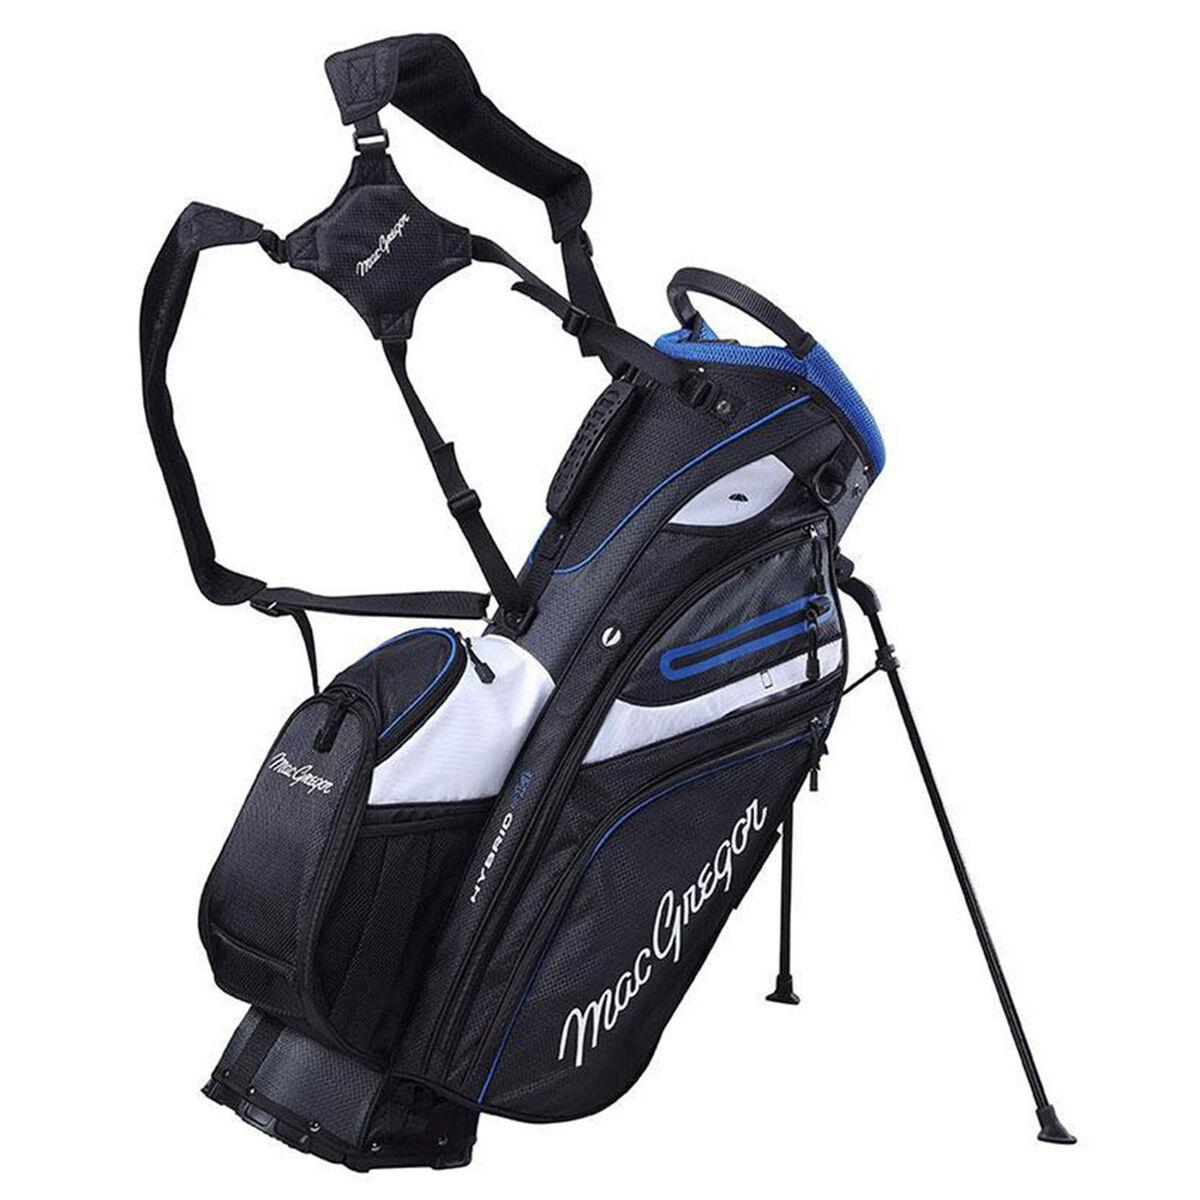 MacGregor Hybrid 14 Golf Stand Bag, Black   American Golf